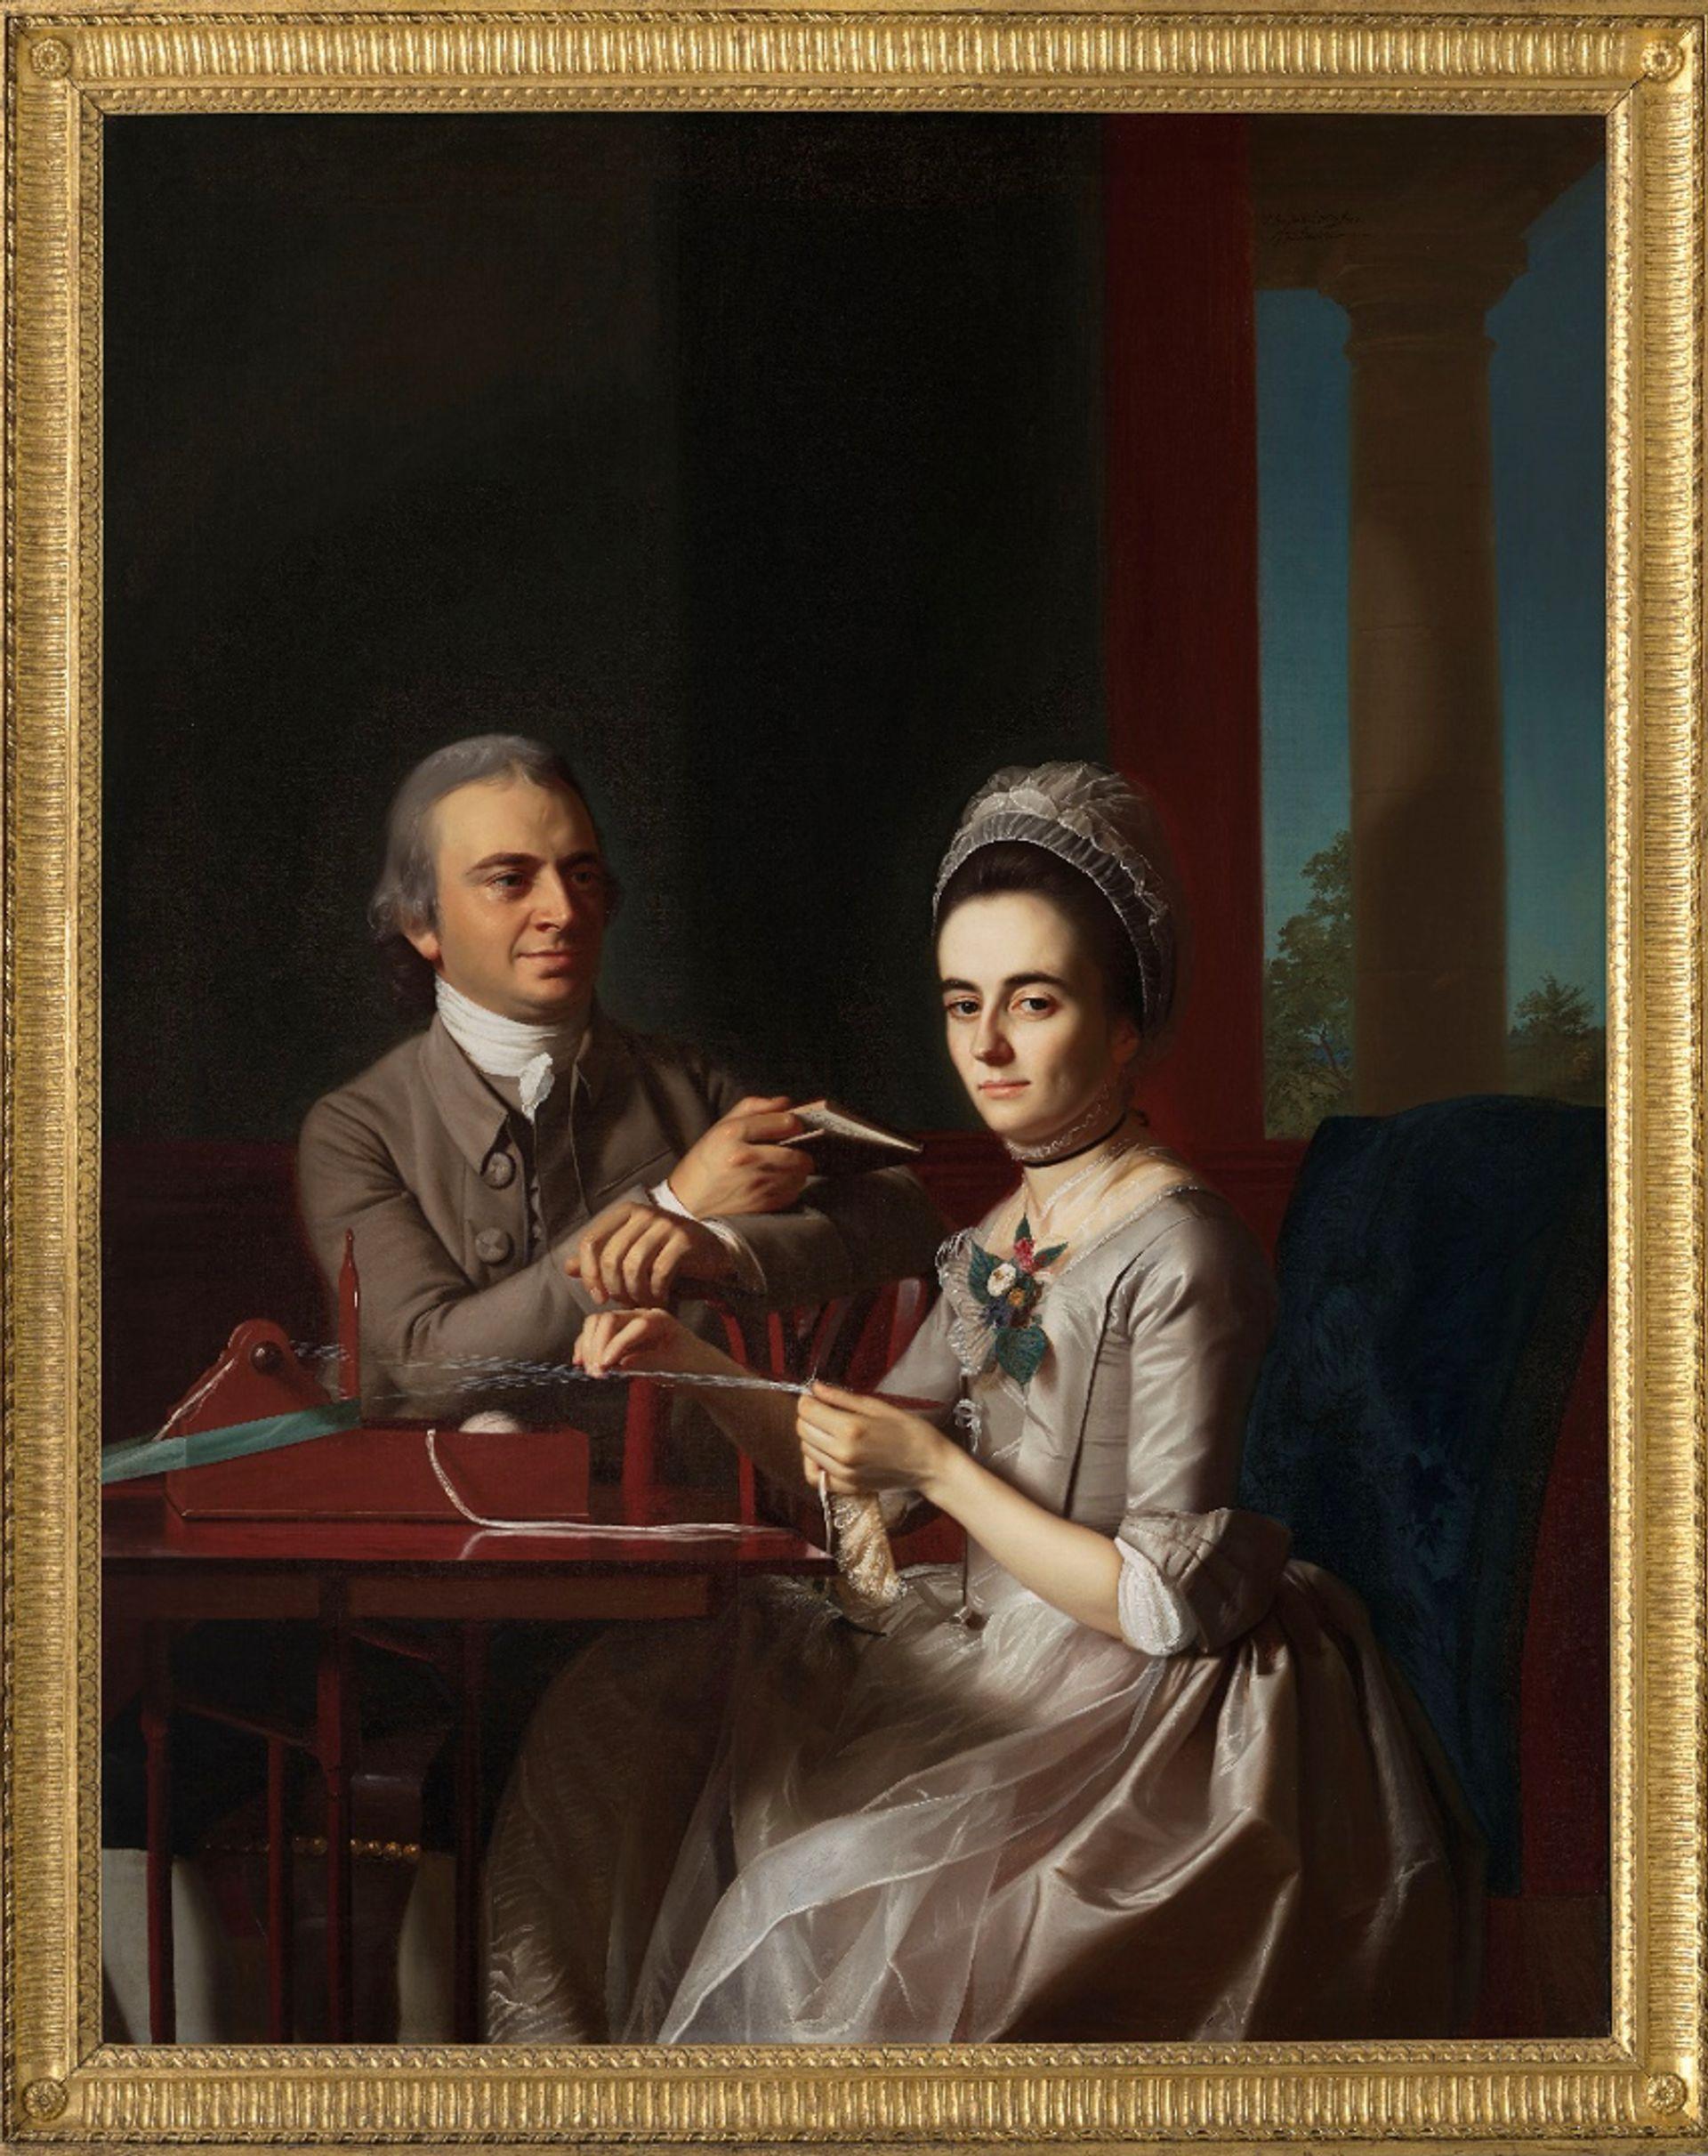 After treatment: John Singleton Copley's Portrait of Mr and Mrs Thomas Mifflin (Sarah Morris) (1773) Image courtesy of the Philadelphia Museum of Art